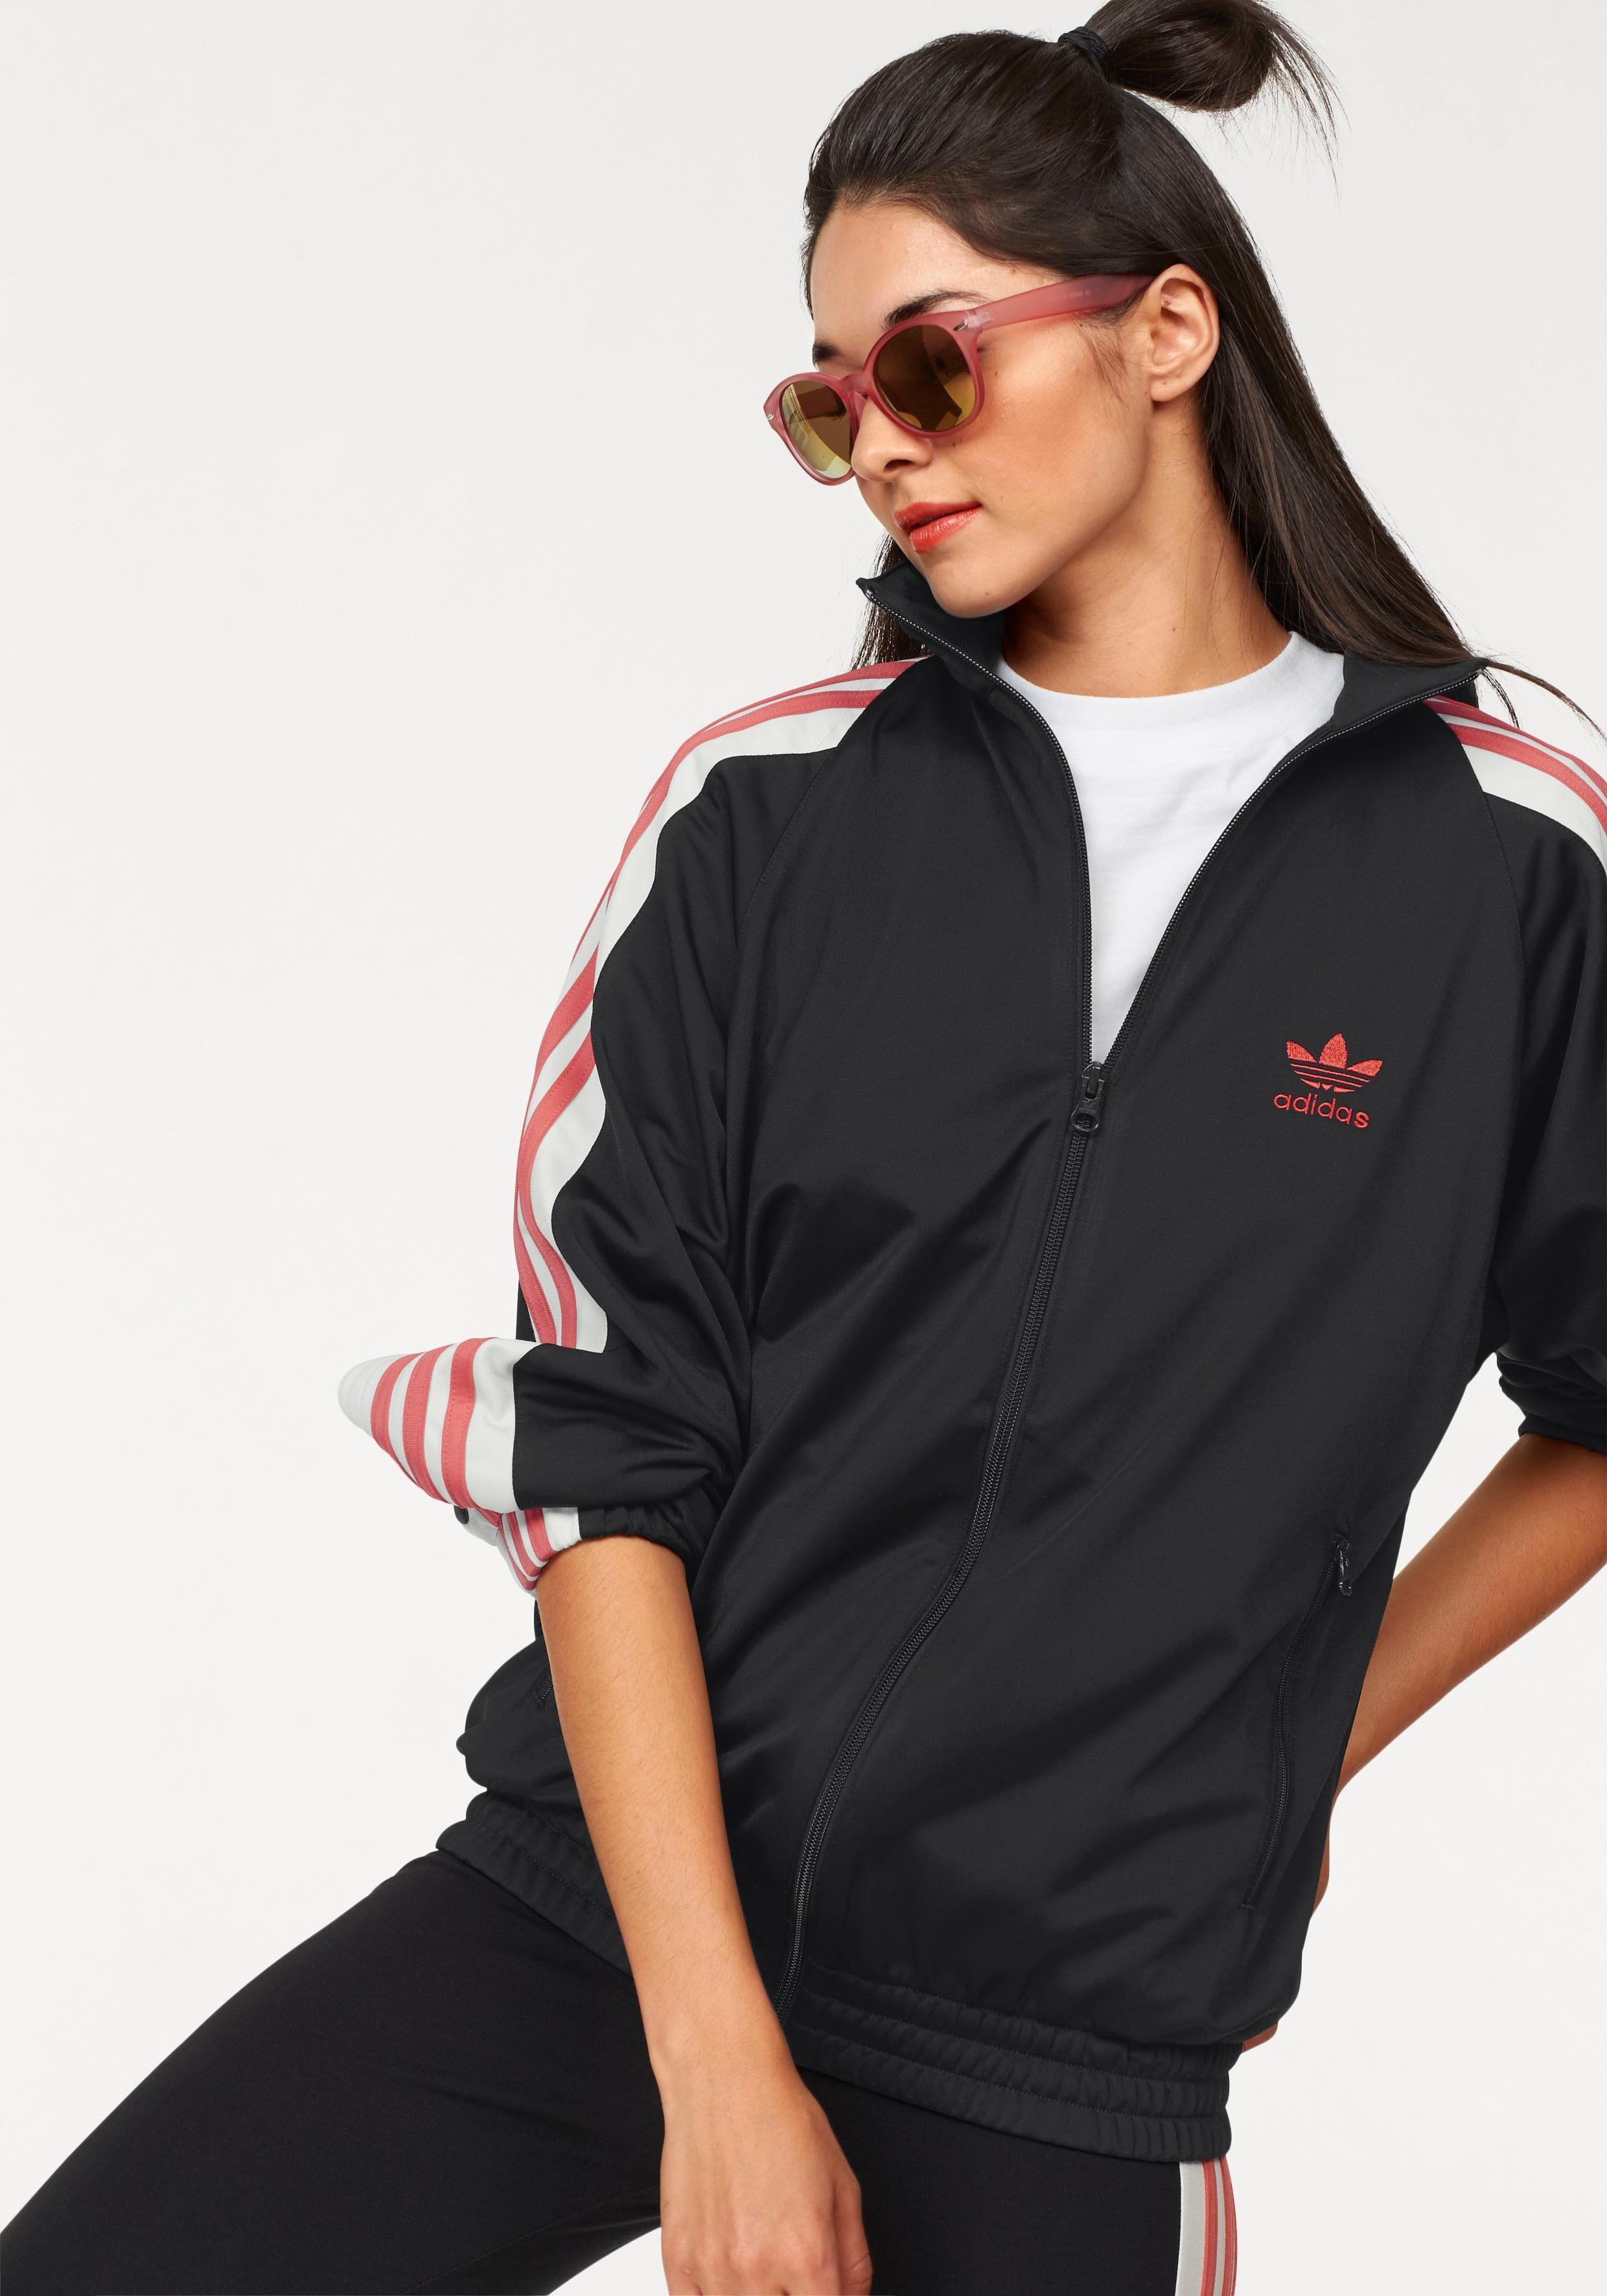 adidas Originals Trainingsjacke »TRACK TOP« Ärmel aufknöpfbar online kaufen   OTTO